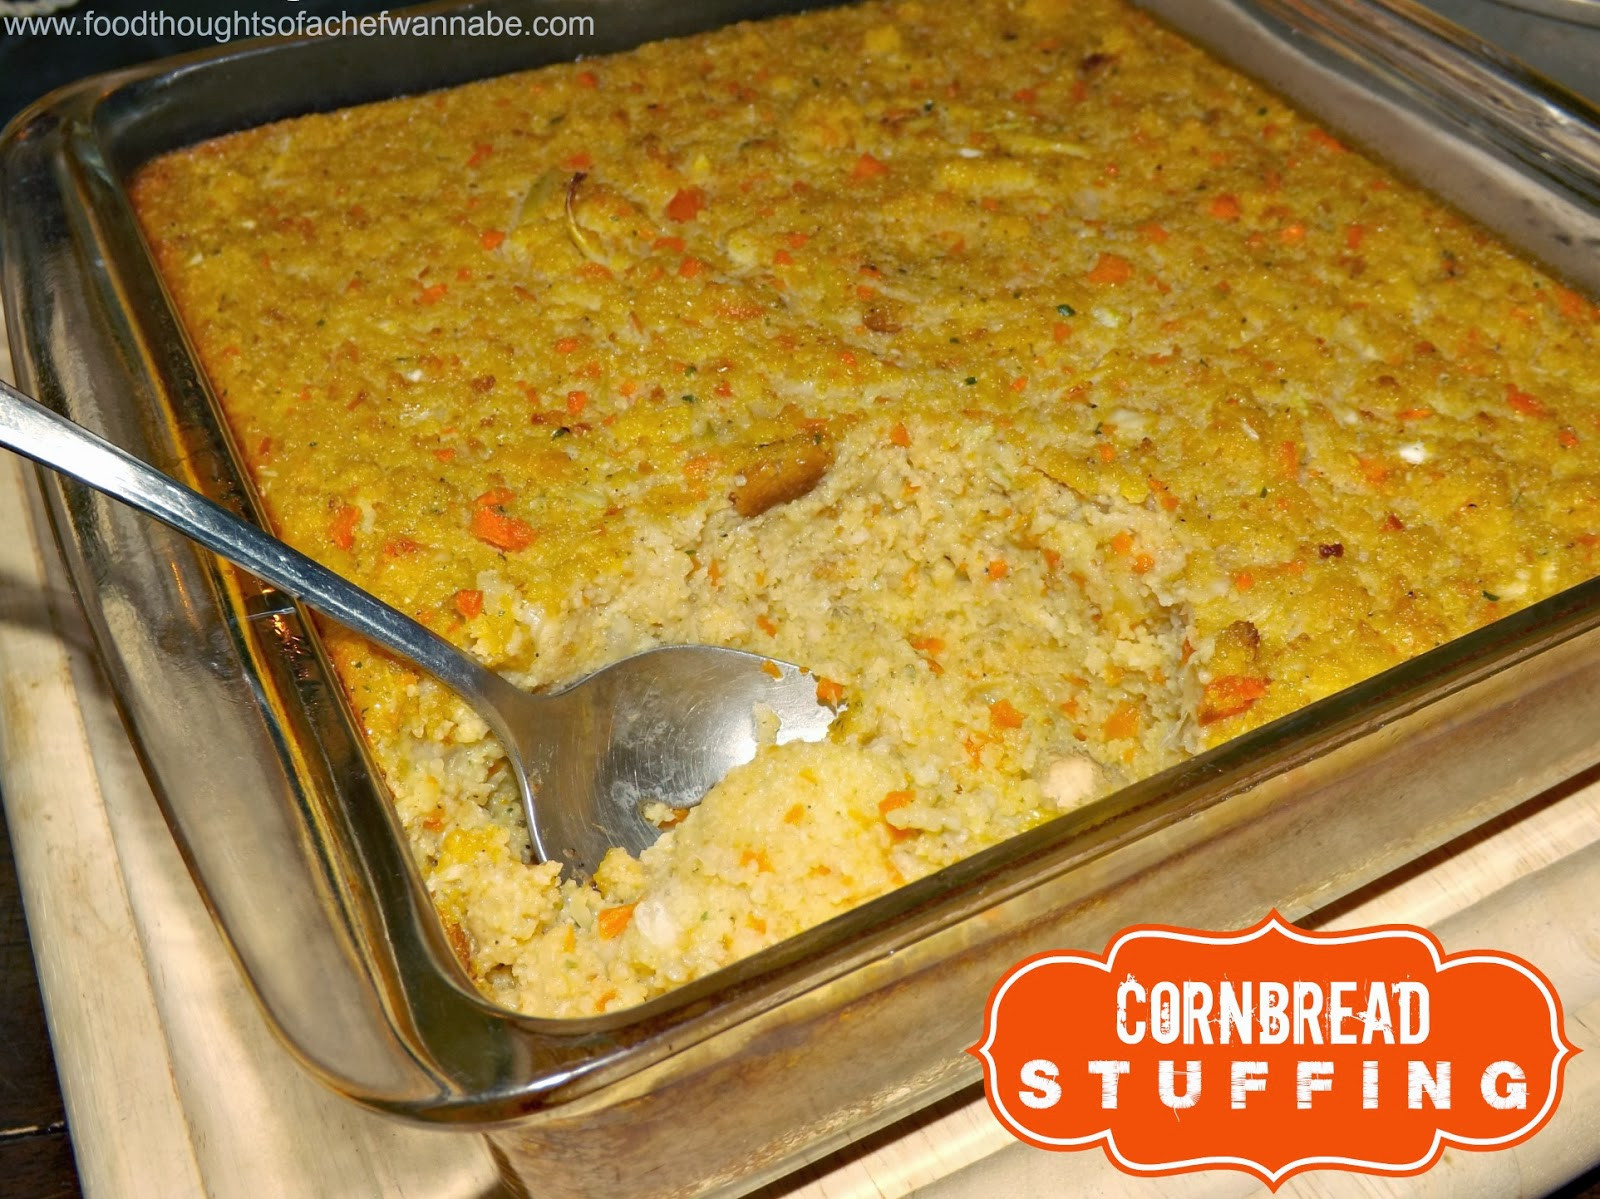 Jiffy Cornbread Dressing  FoodThoughts aChefWannabe Cornbread Stuffing